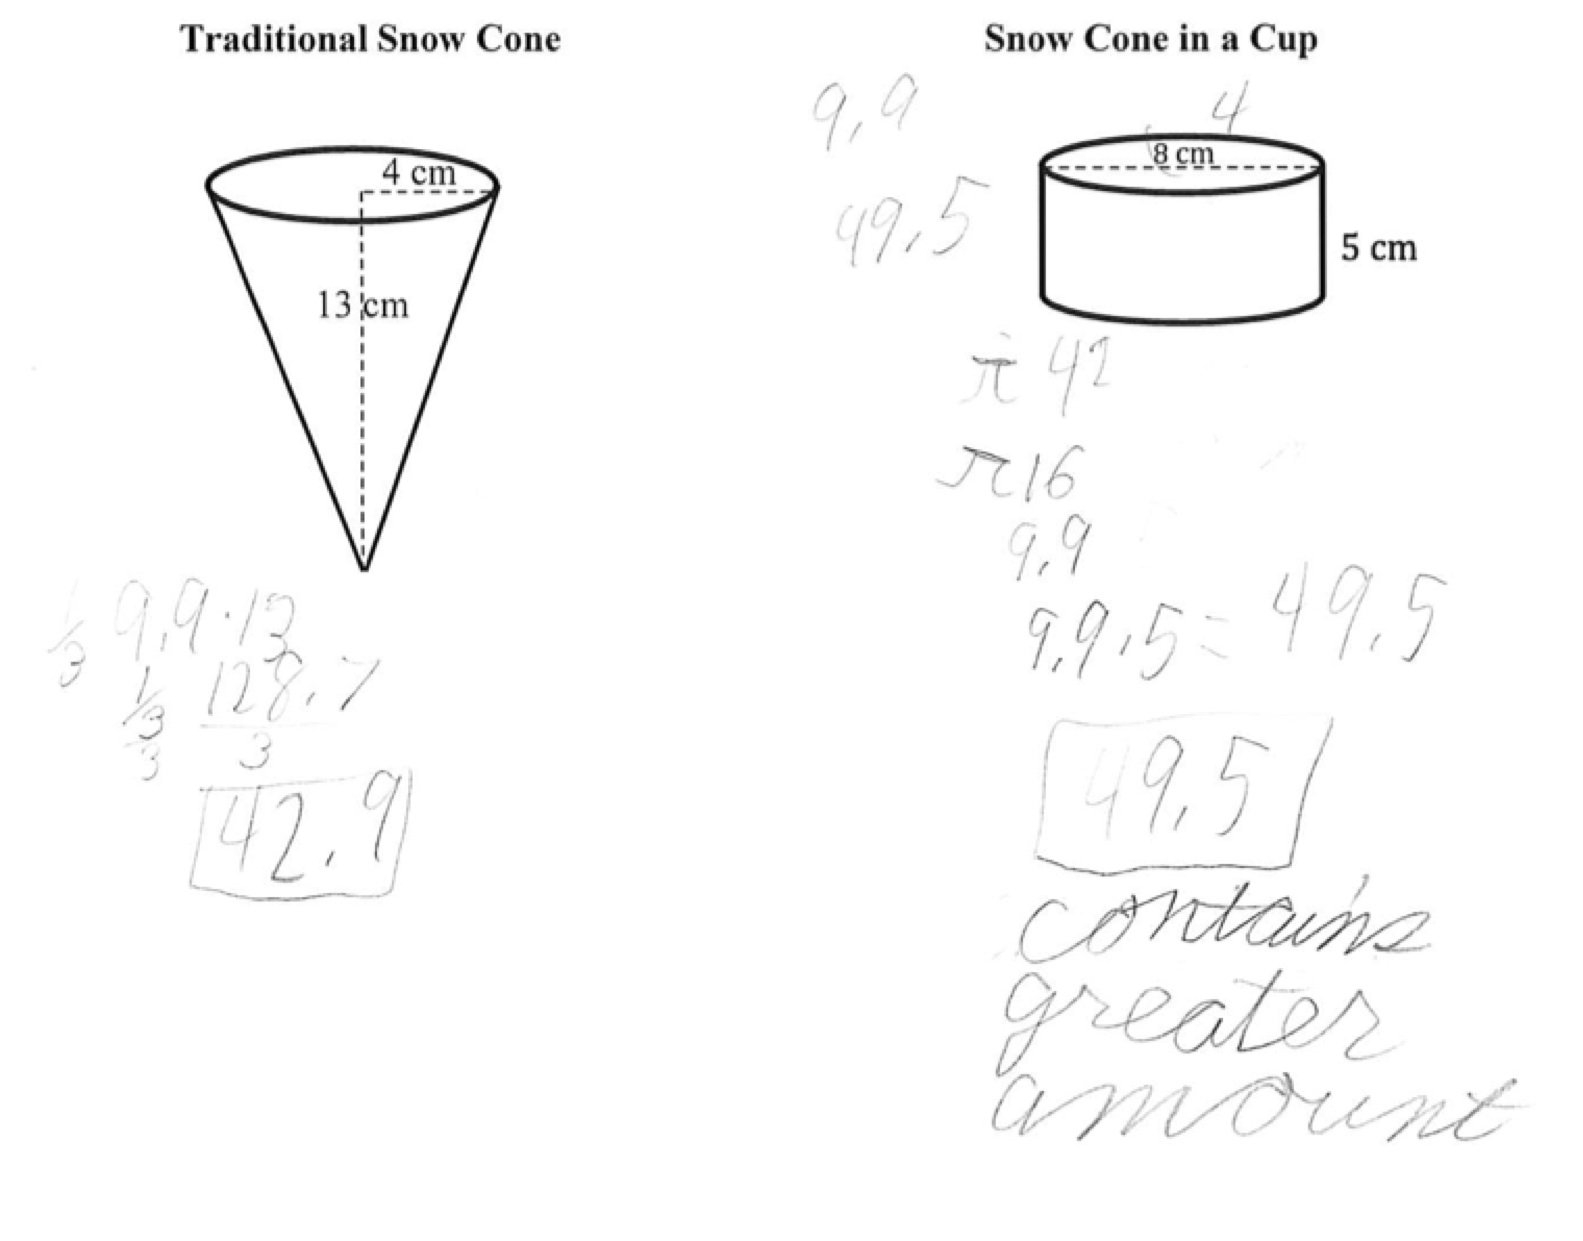 Volume Cylinder Worksheet Answers